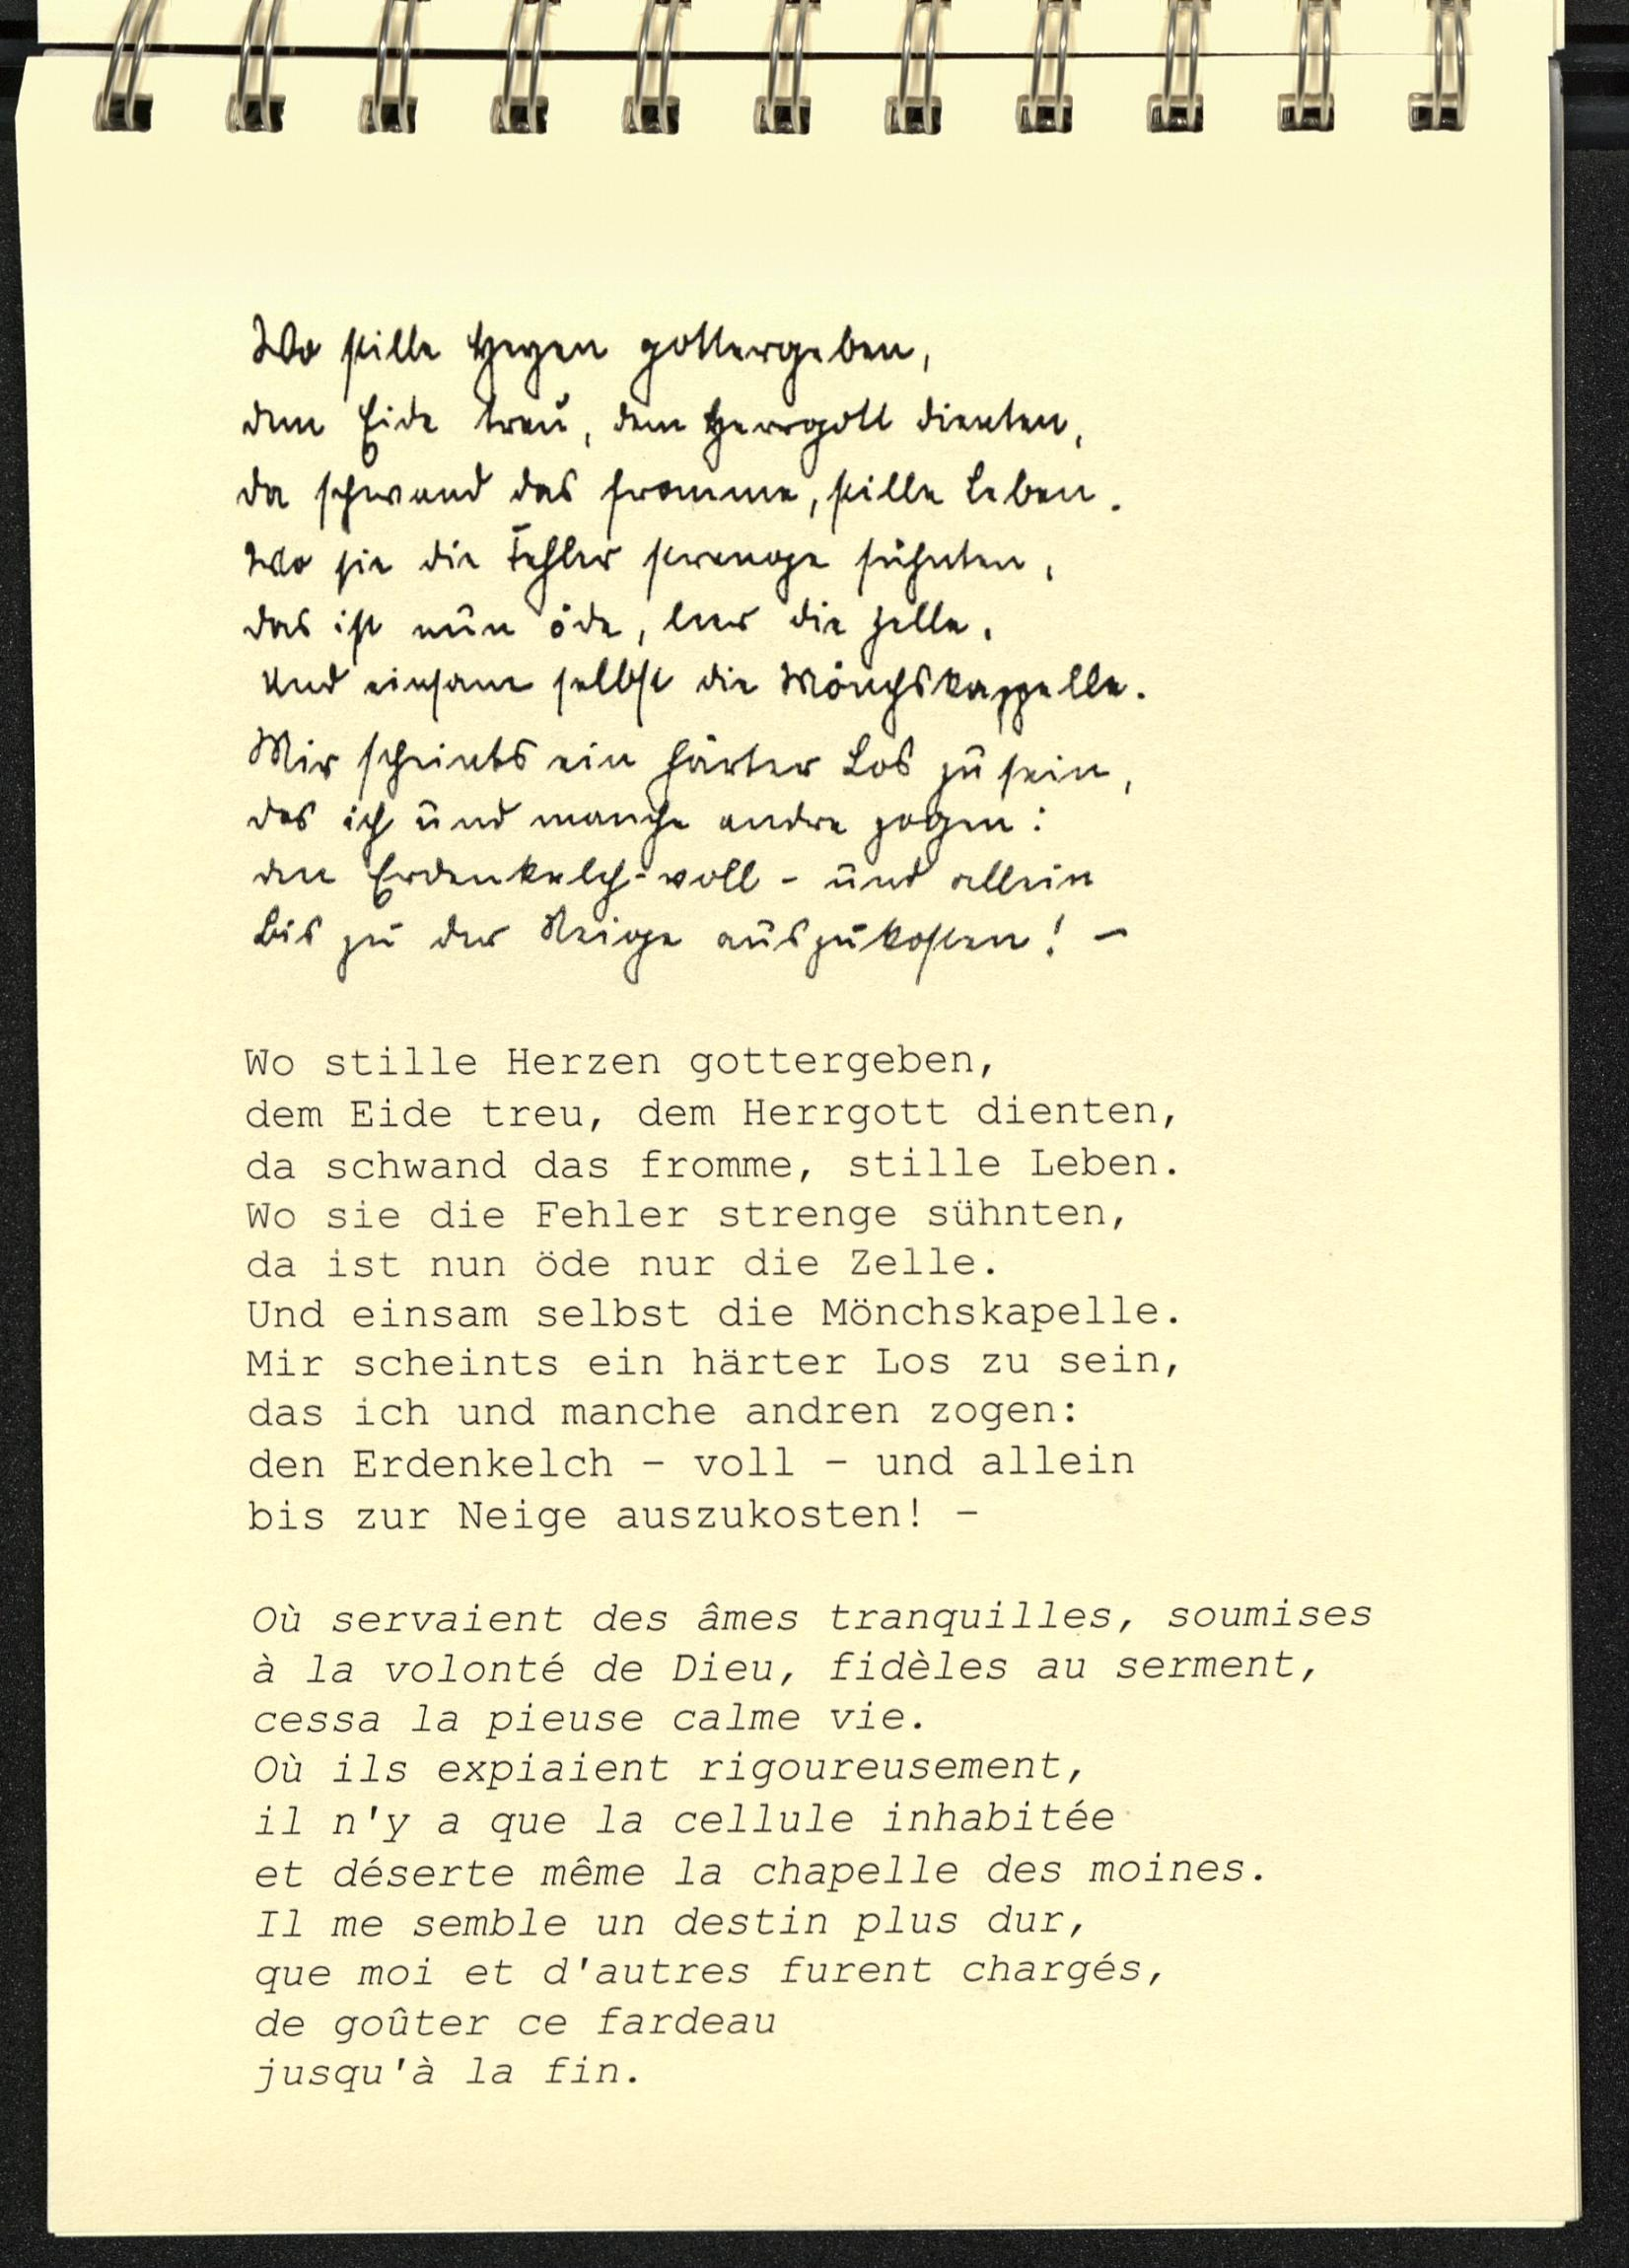 Gedichte Des Leutnants Der Reserve Franz Berens Item 41